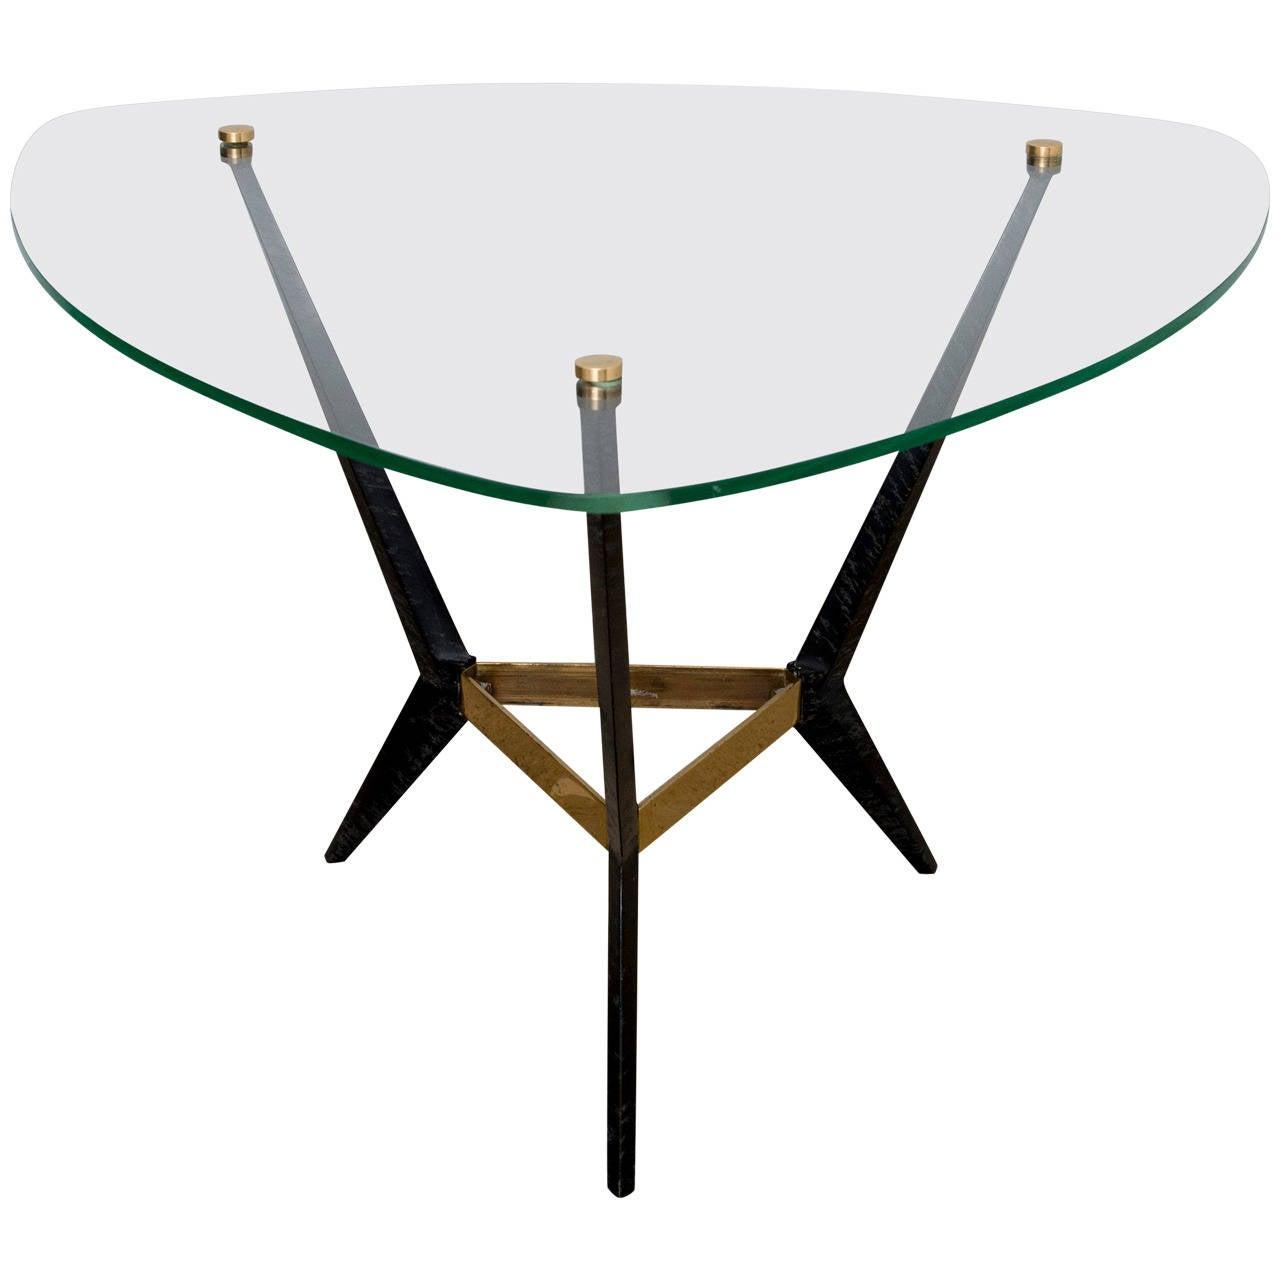 Angelo Ostuni Italian Triangular Midcentury Brass And Steel Side Table 1